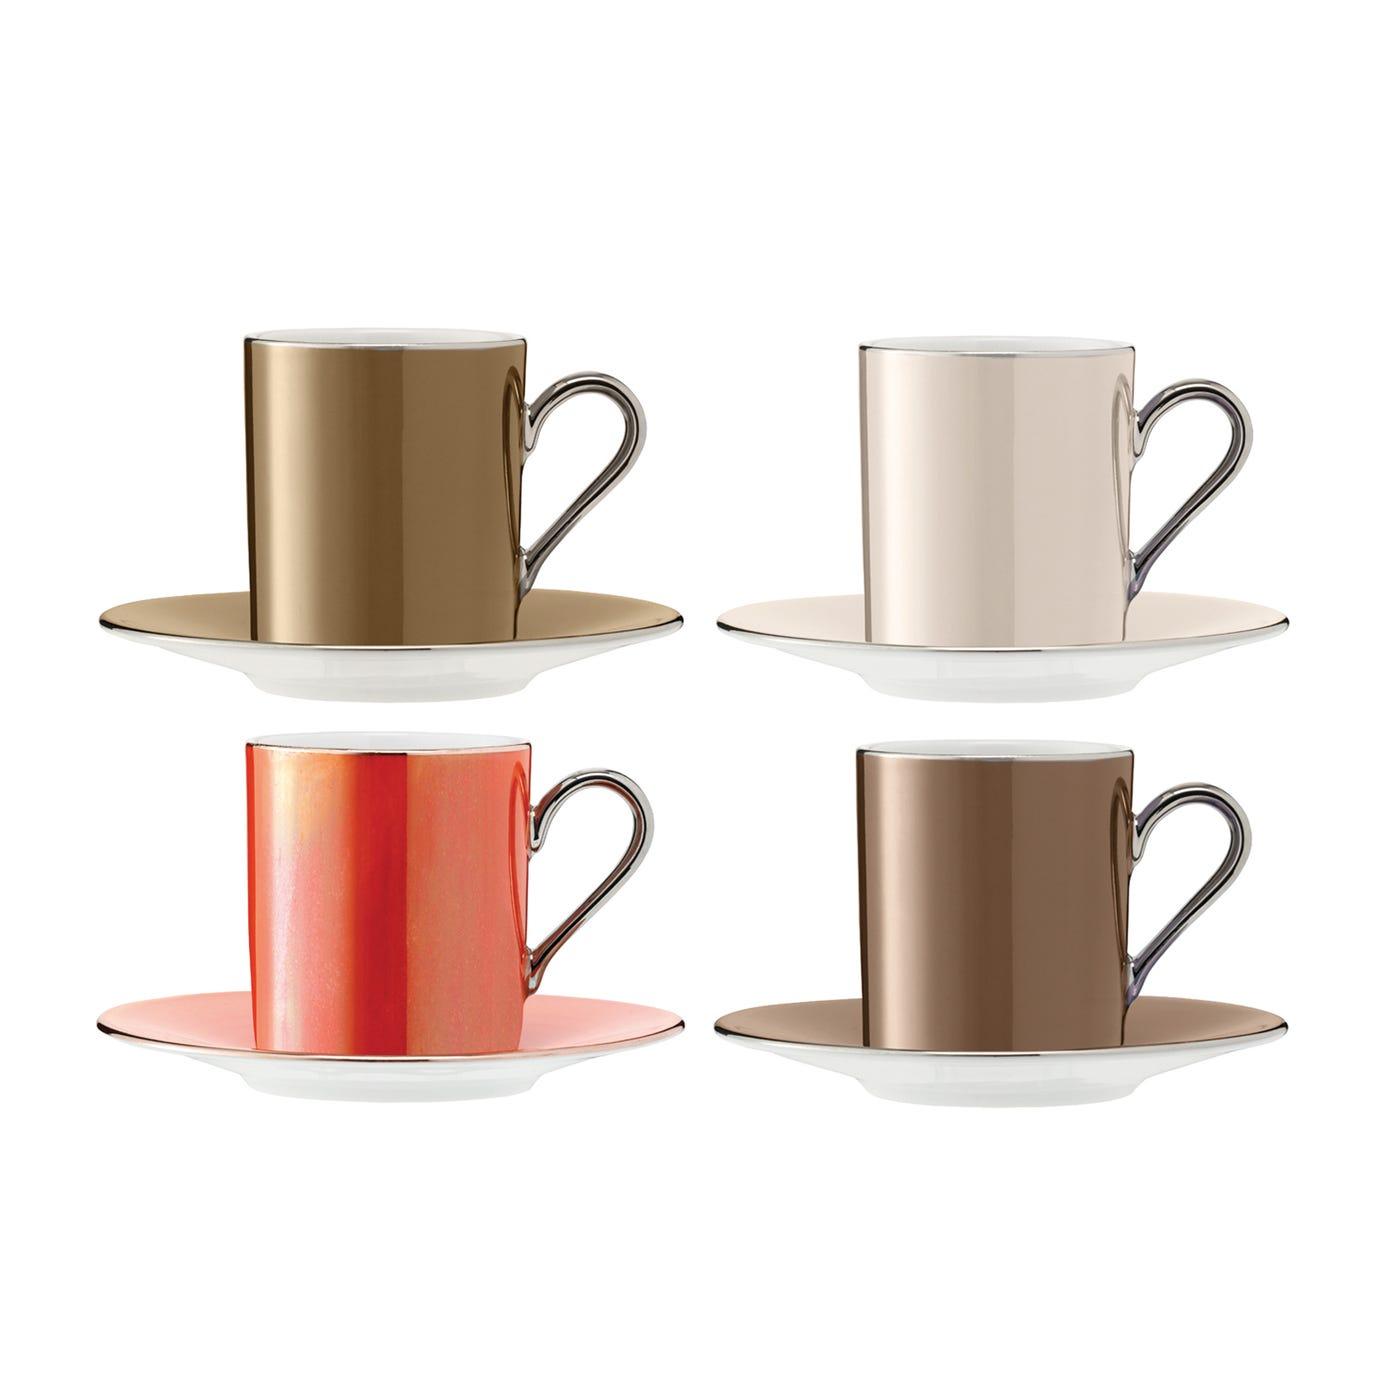 LSA International Polka Coffee Cup & Saucer Metallic Set Of 4